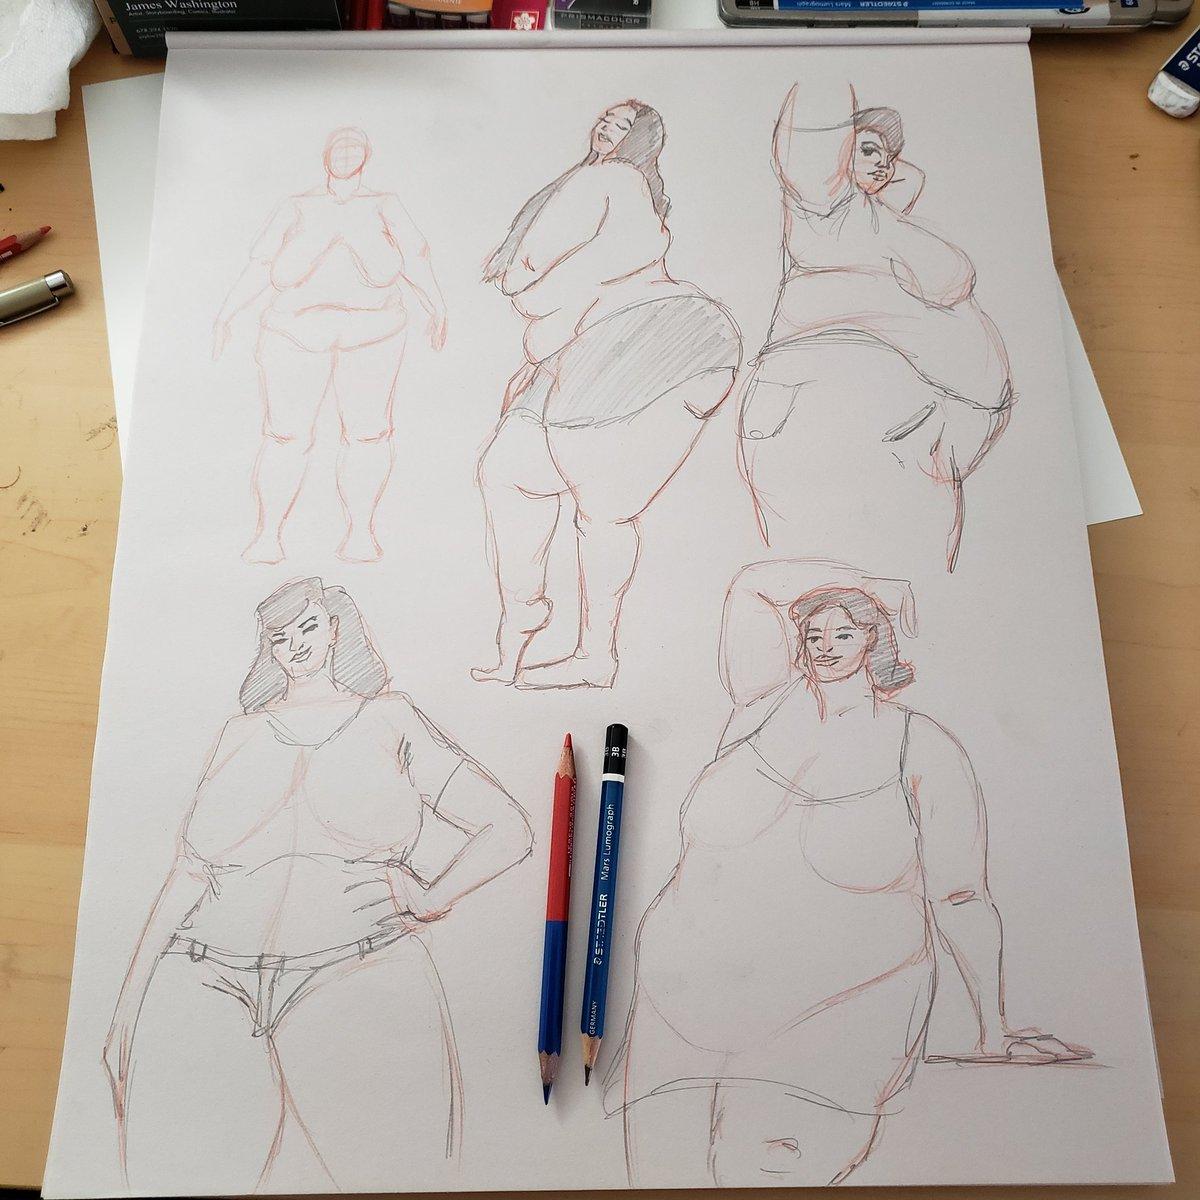 Some body positive sketches #bodypositivity #fatandfabulous #bbwart https://t.co/eDrco3kpgG